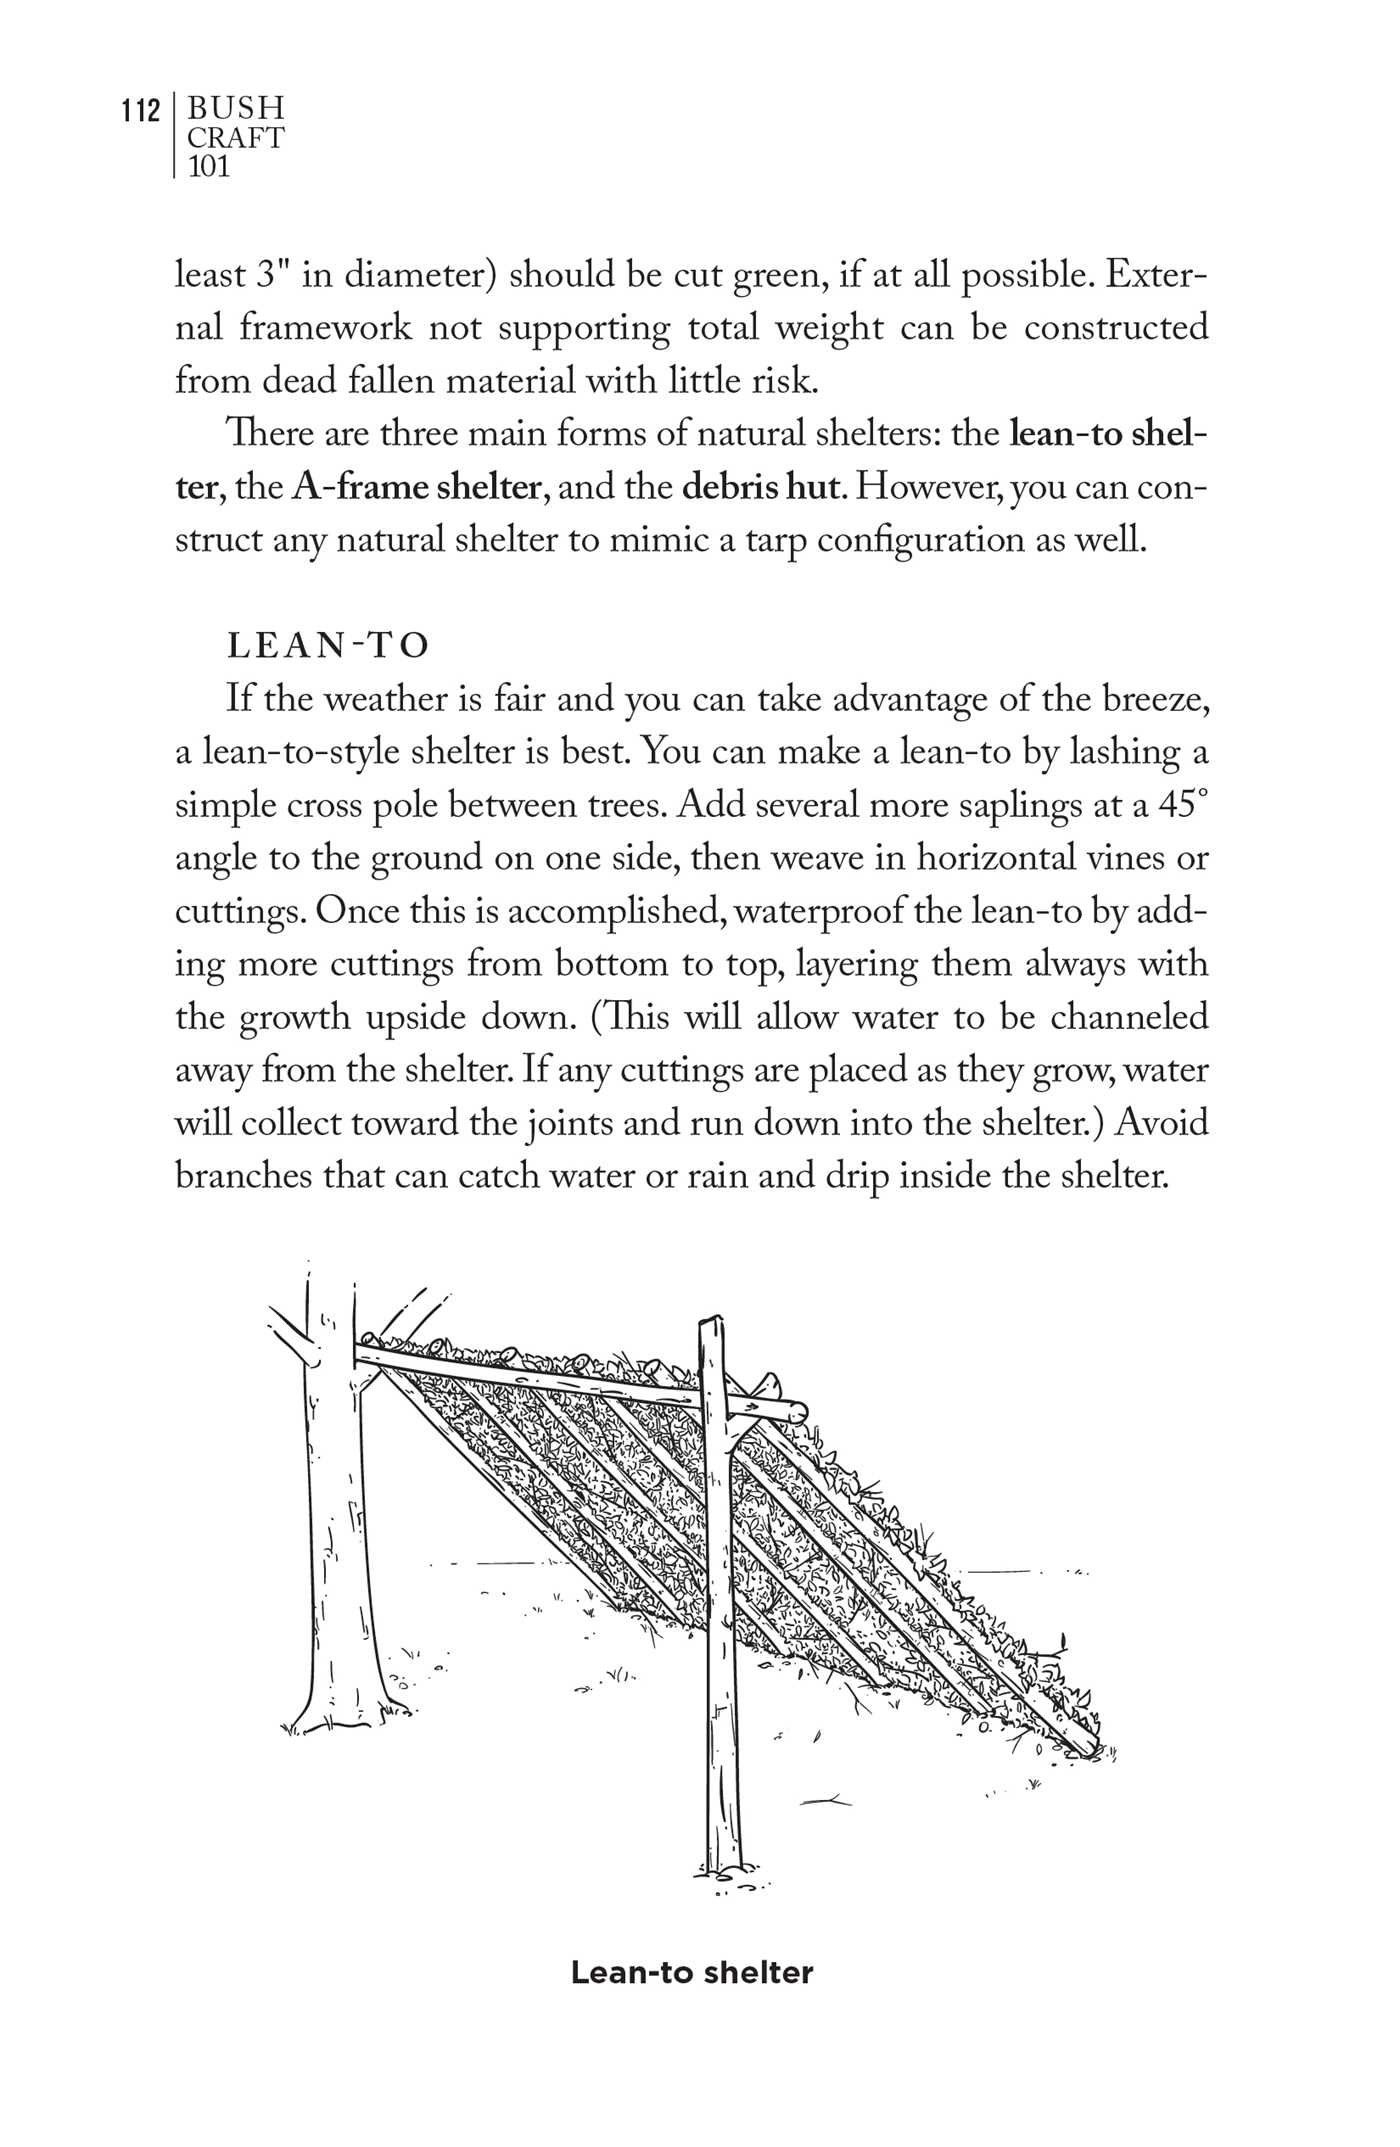 Bushcraft 101 A Field Guide To The Art Of Wilderness Survival Paperback September 1 2014 Guide Art Fiel Survival Courses Bushcraft Wilderness Survival